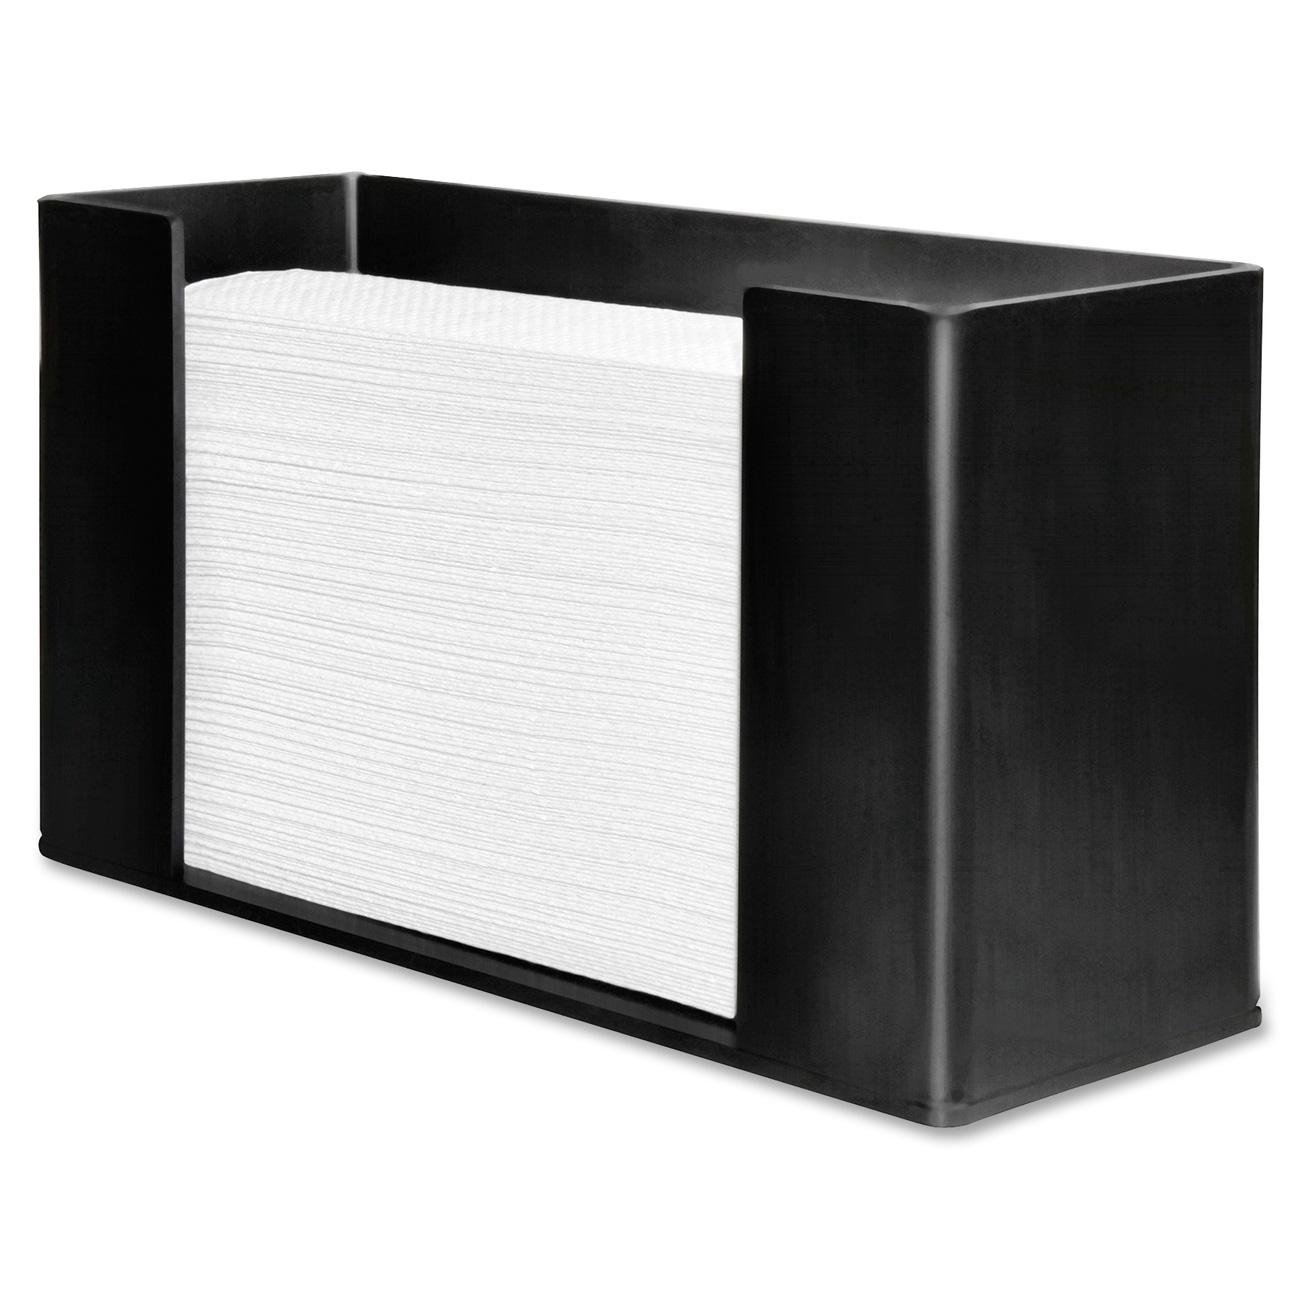 Genuine Joe GJO11524 Acrylic C Fold/Multifold Paper Towel Dispenser, 11-1/2'' Length x 4-3/32'' Width x 6-51/64'' Height, Black